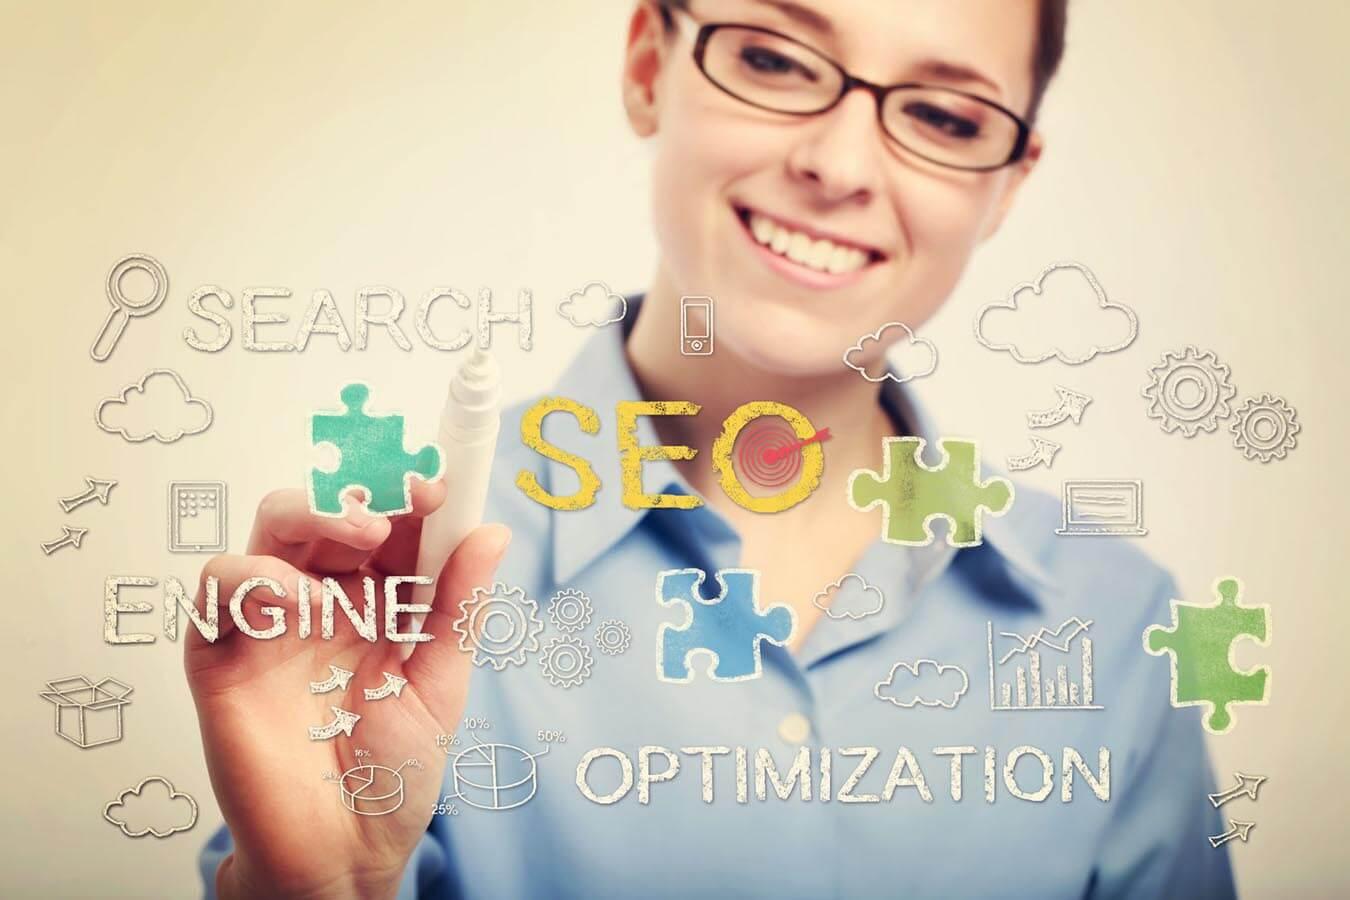 Kurth digital solutions Seo girl web development